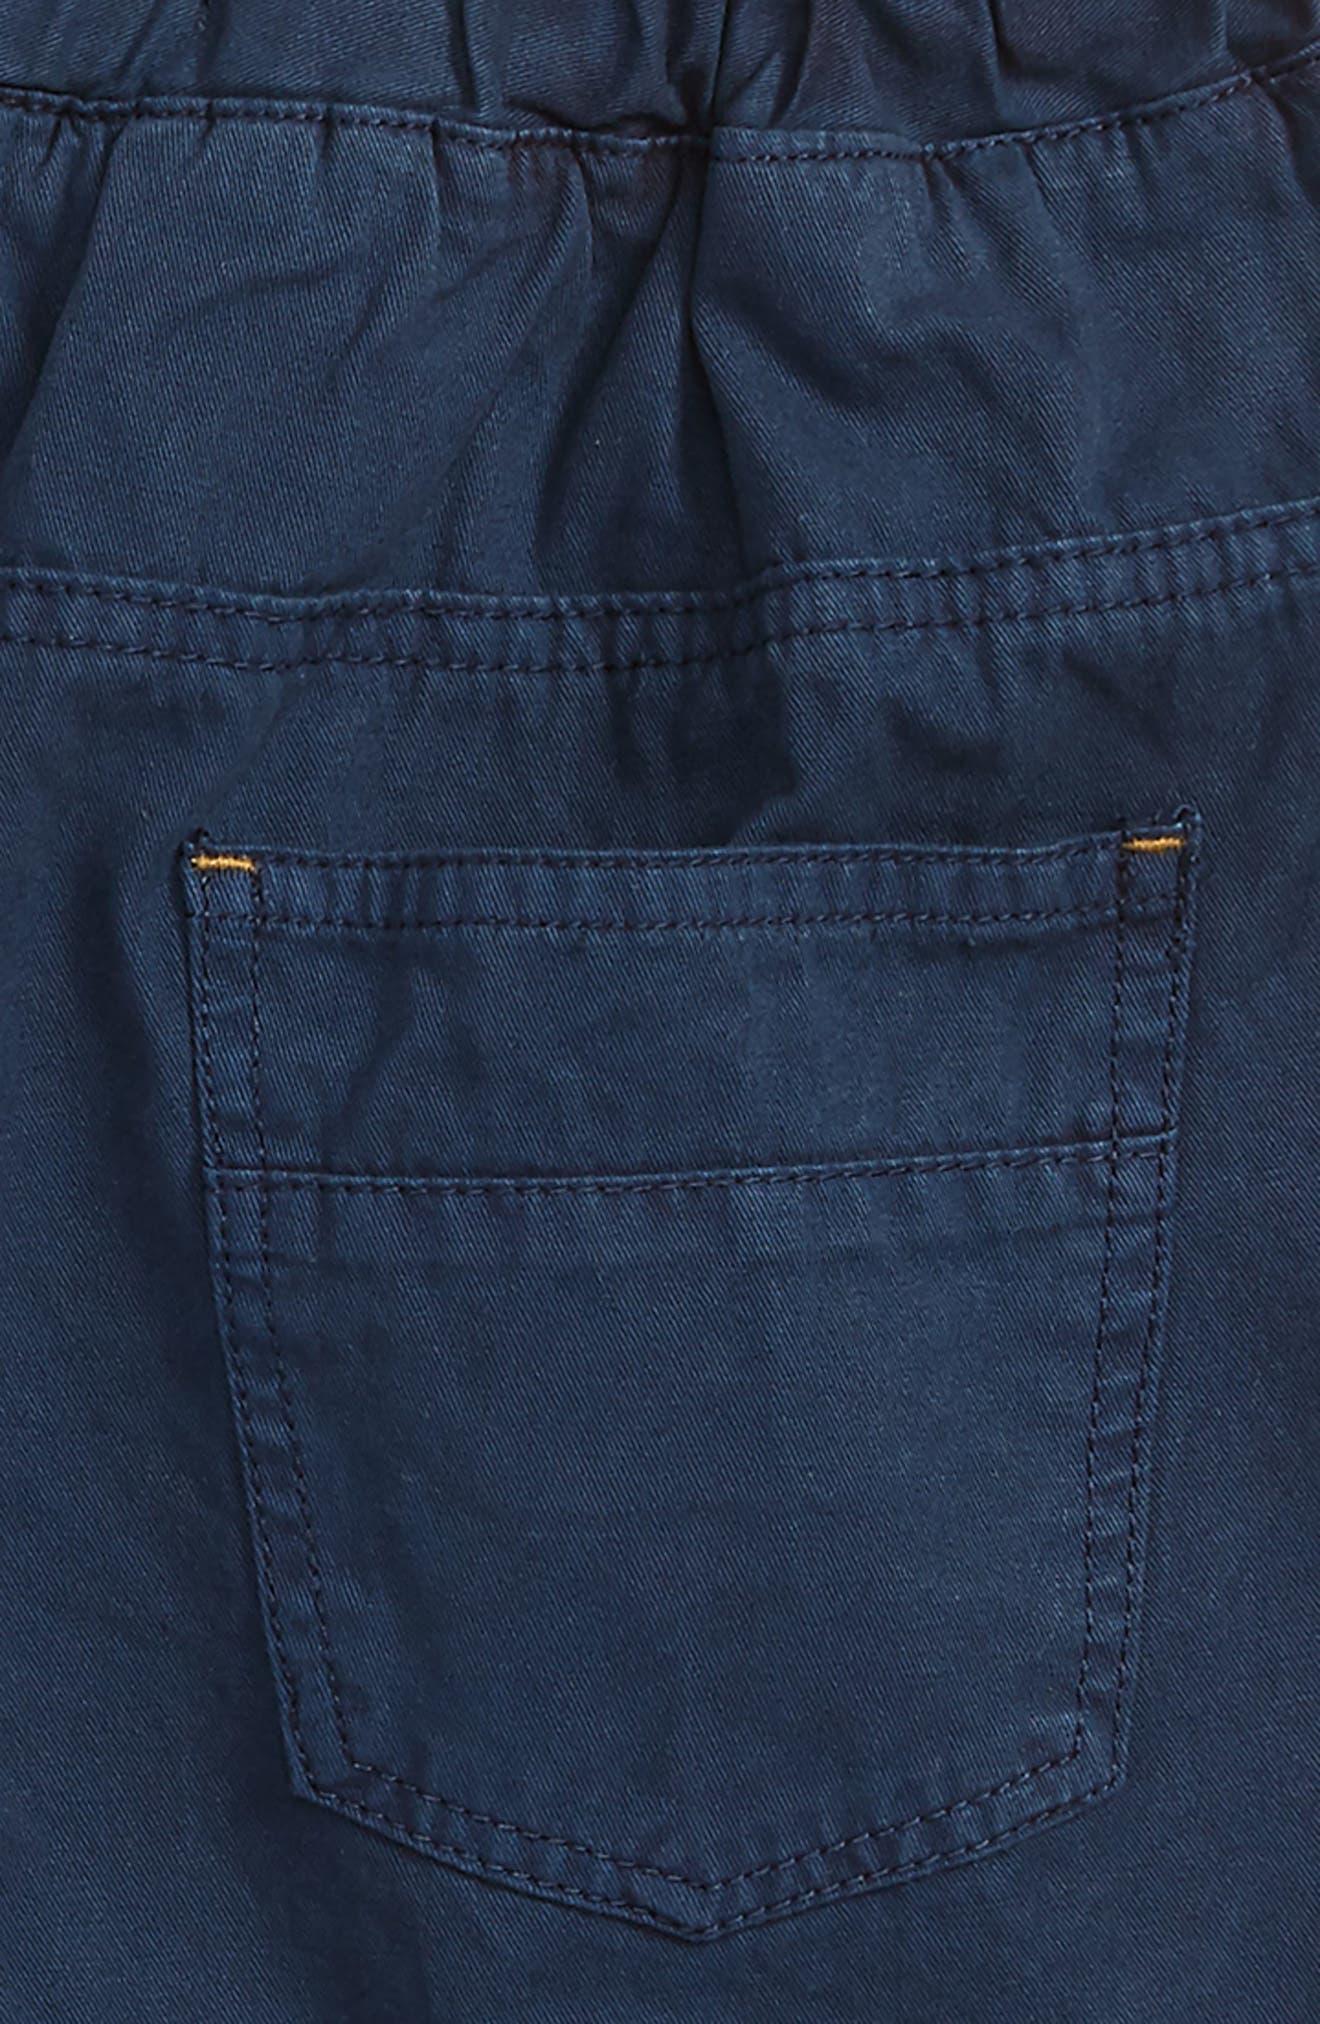 Alternate Image 3  - Peek Morgan Shorts (Toddler Boys, Little Boys & Big Boys)